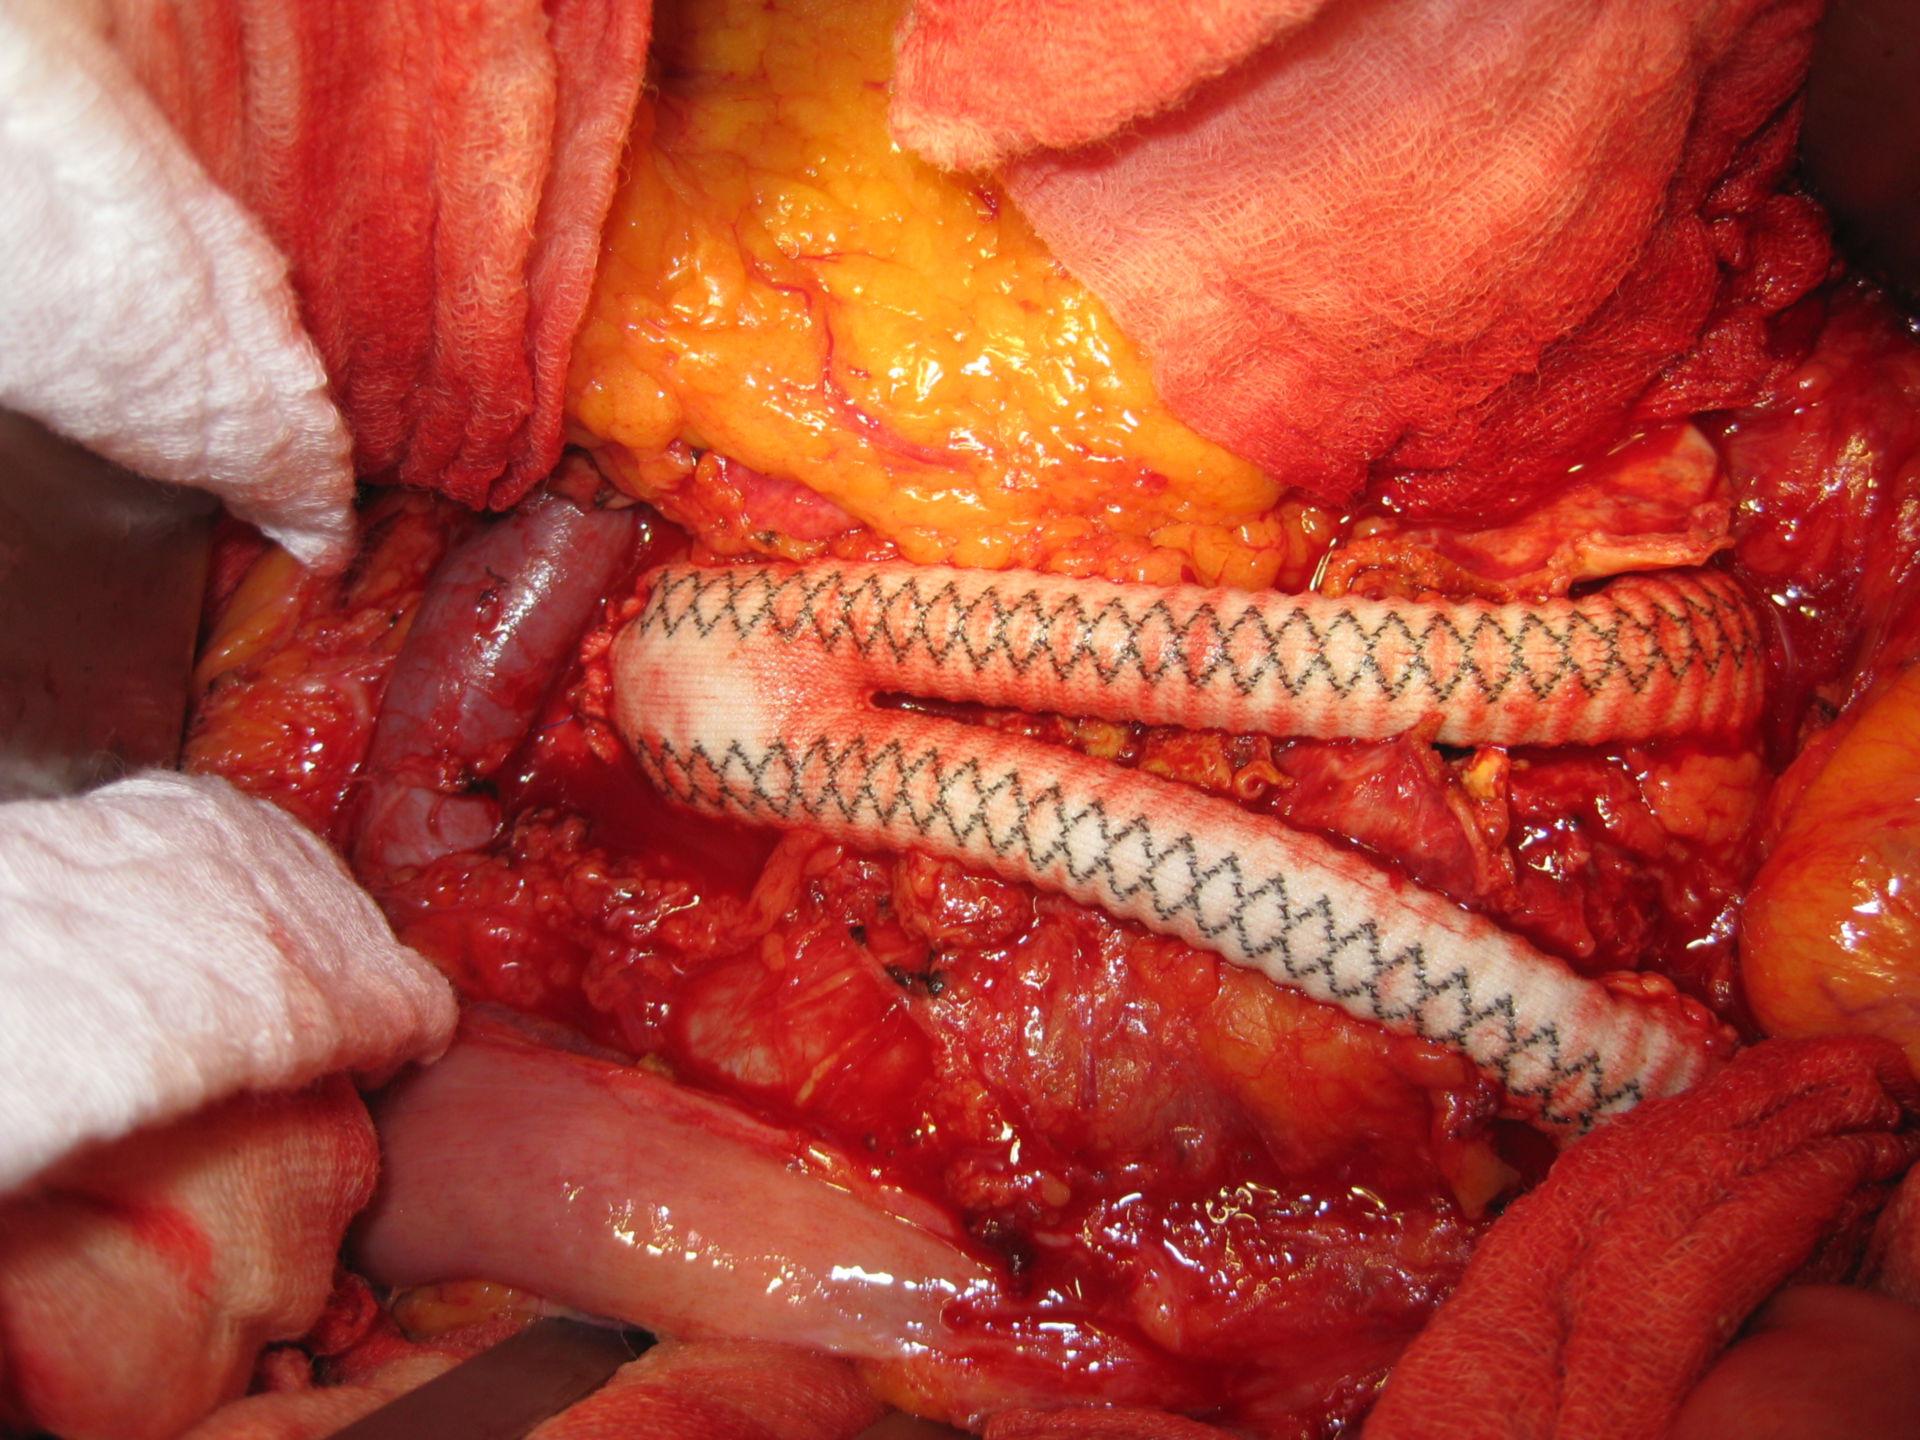 Aneurysm of the abdominal aorta - Y-prosthesis